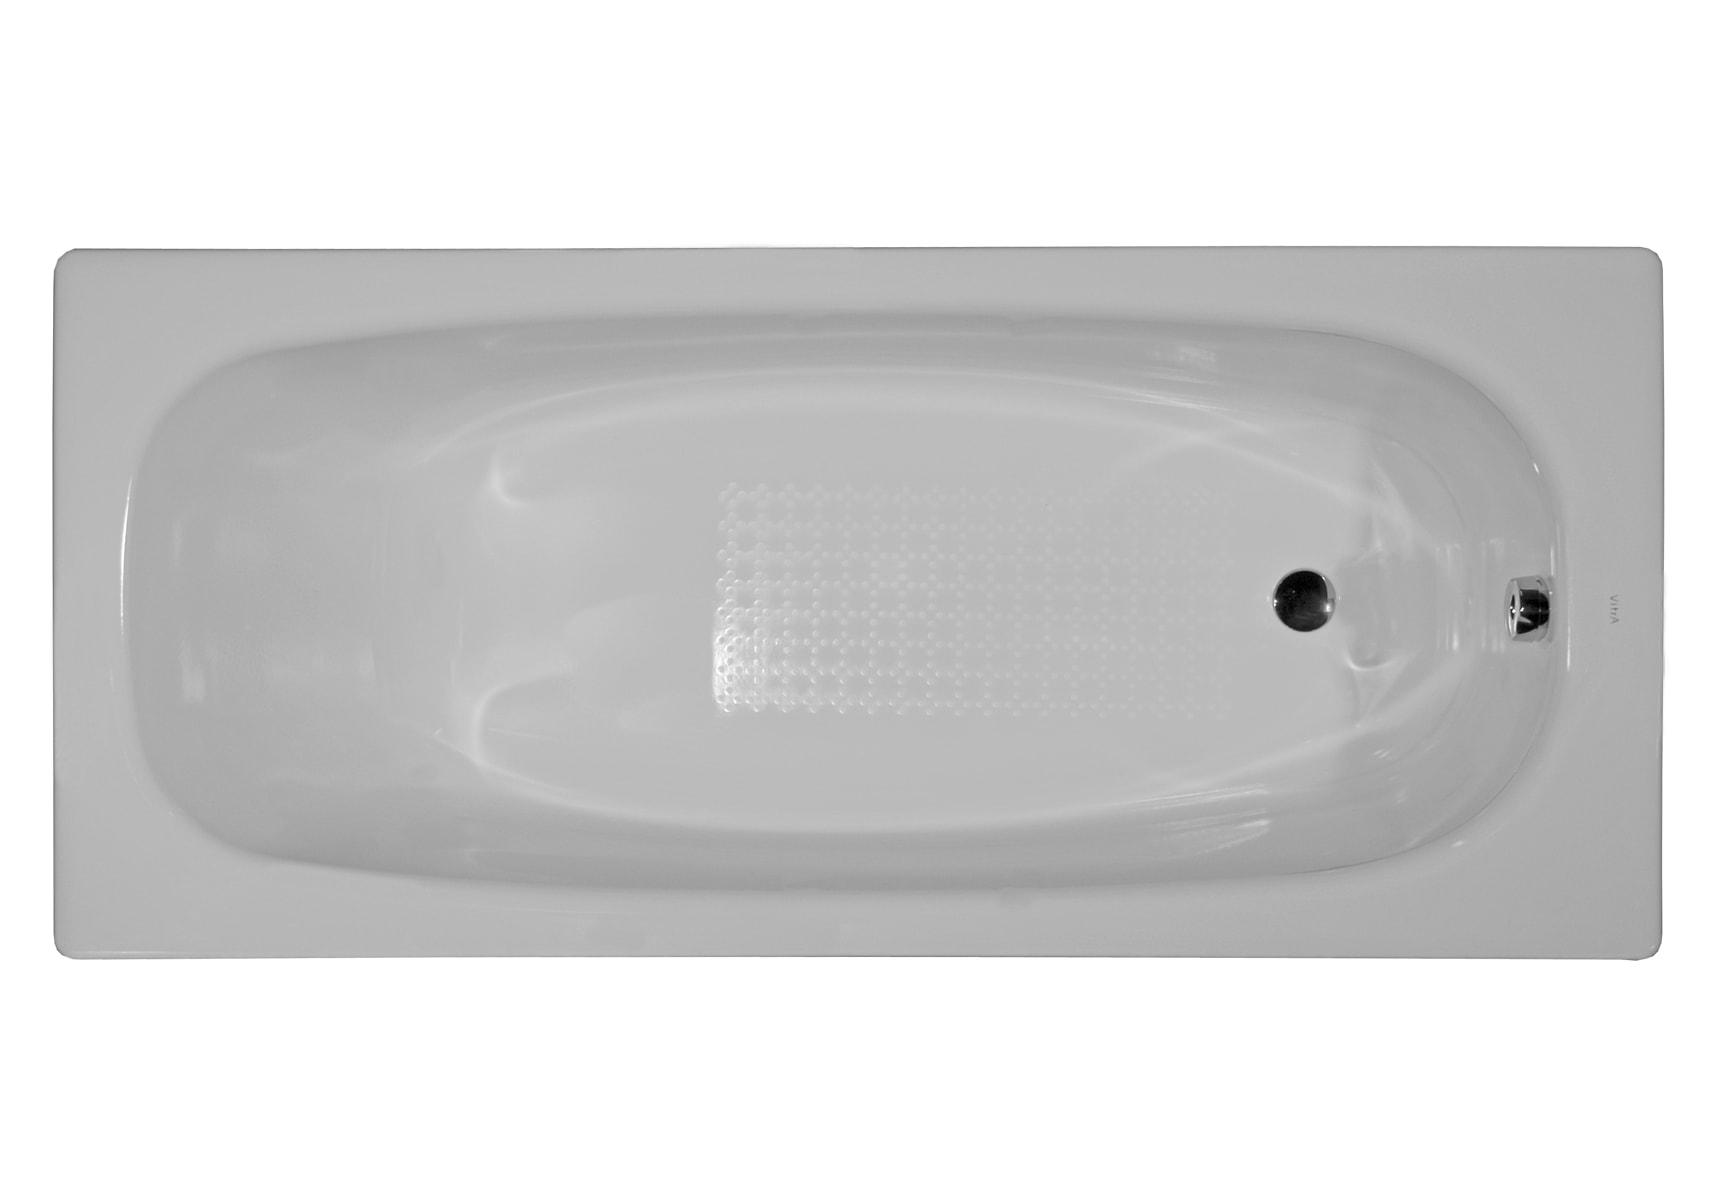 Generic Steel Bathtub, 3.5mm, Sound Proofing Pad